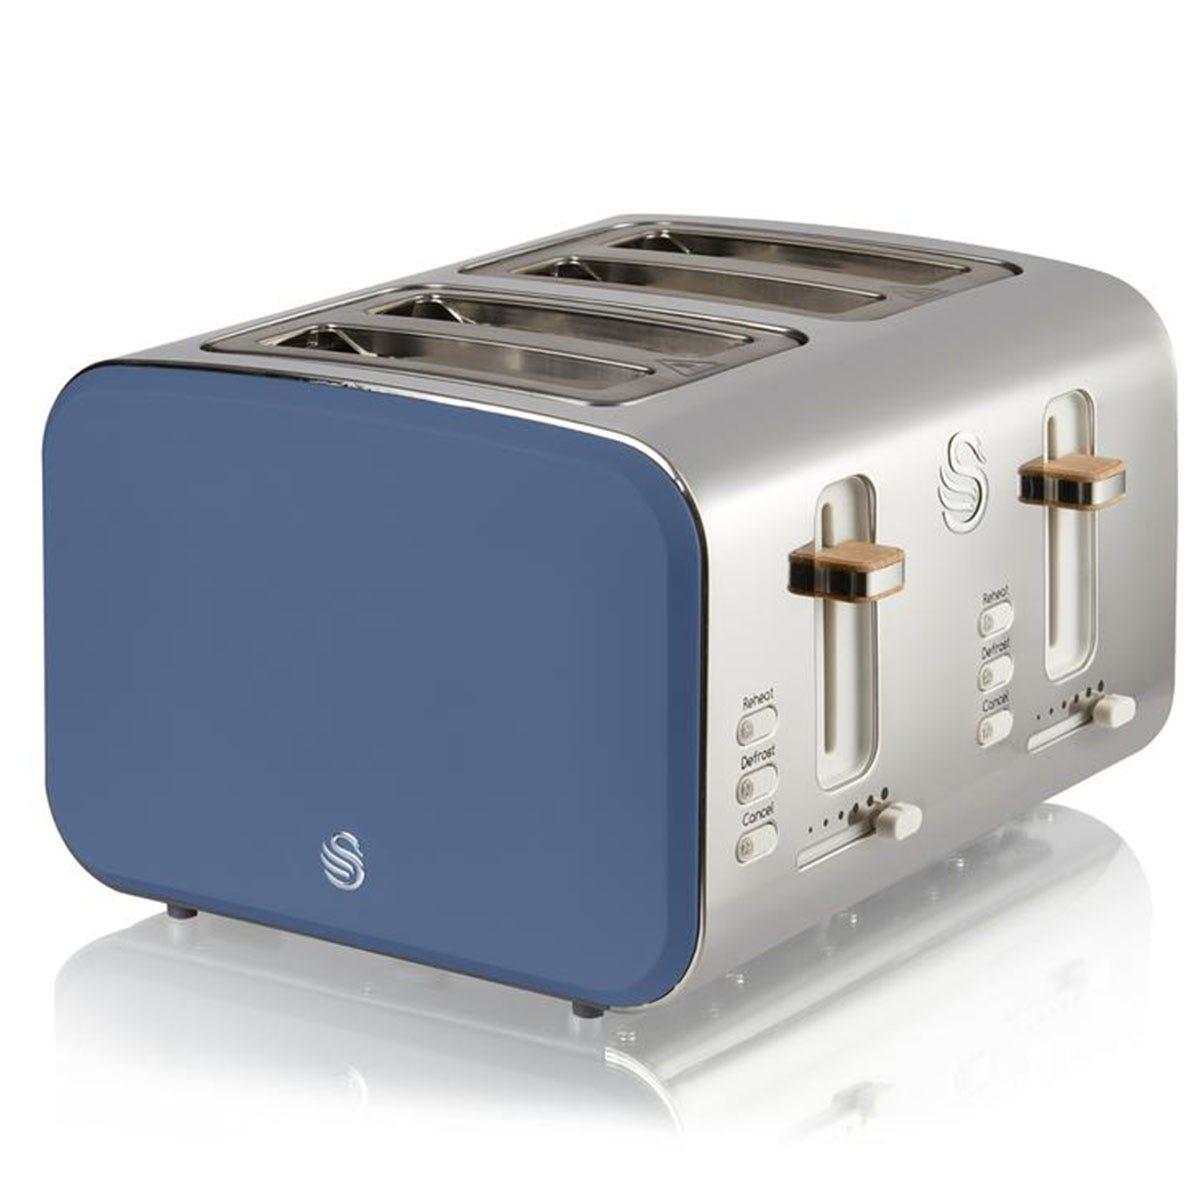 Swan ST14620BLUN 4-Slice Nordic Toaster - Nordic Blue